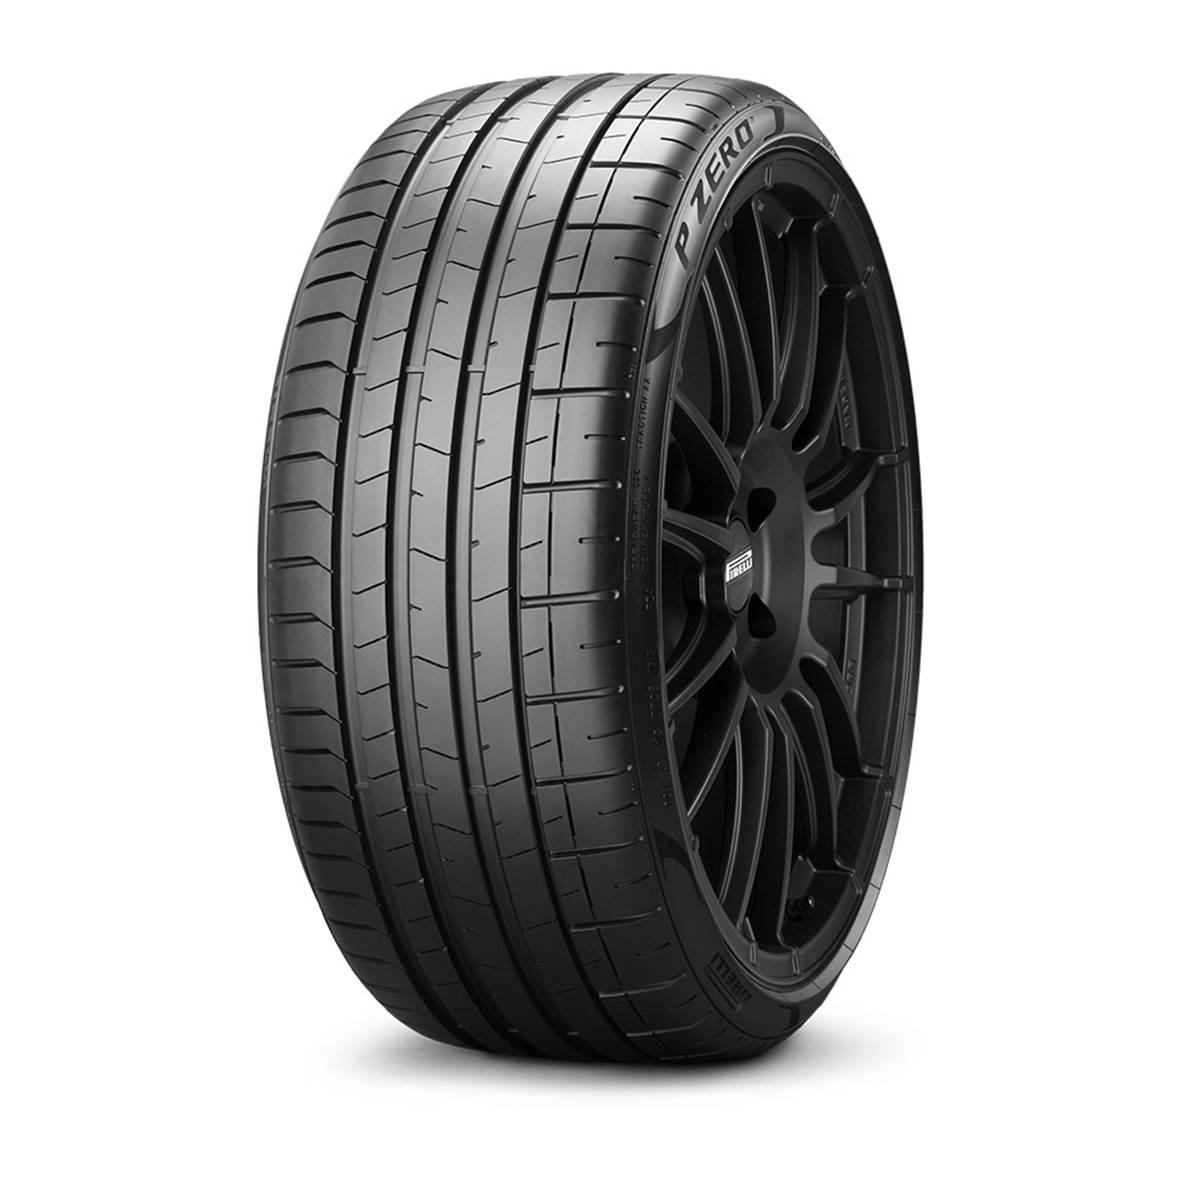 Pneu Pirelli 255/35R19 96Y Pzero Asimmetrico XL